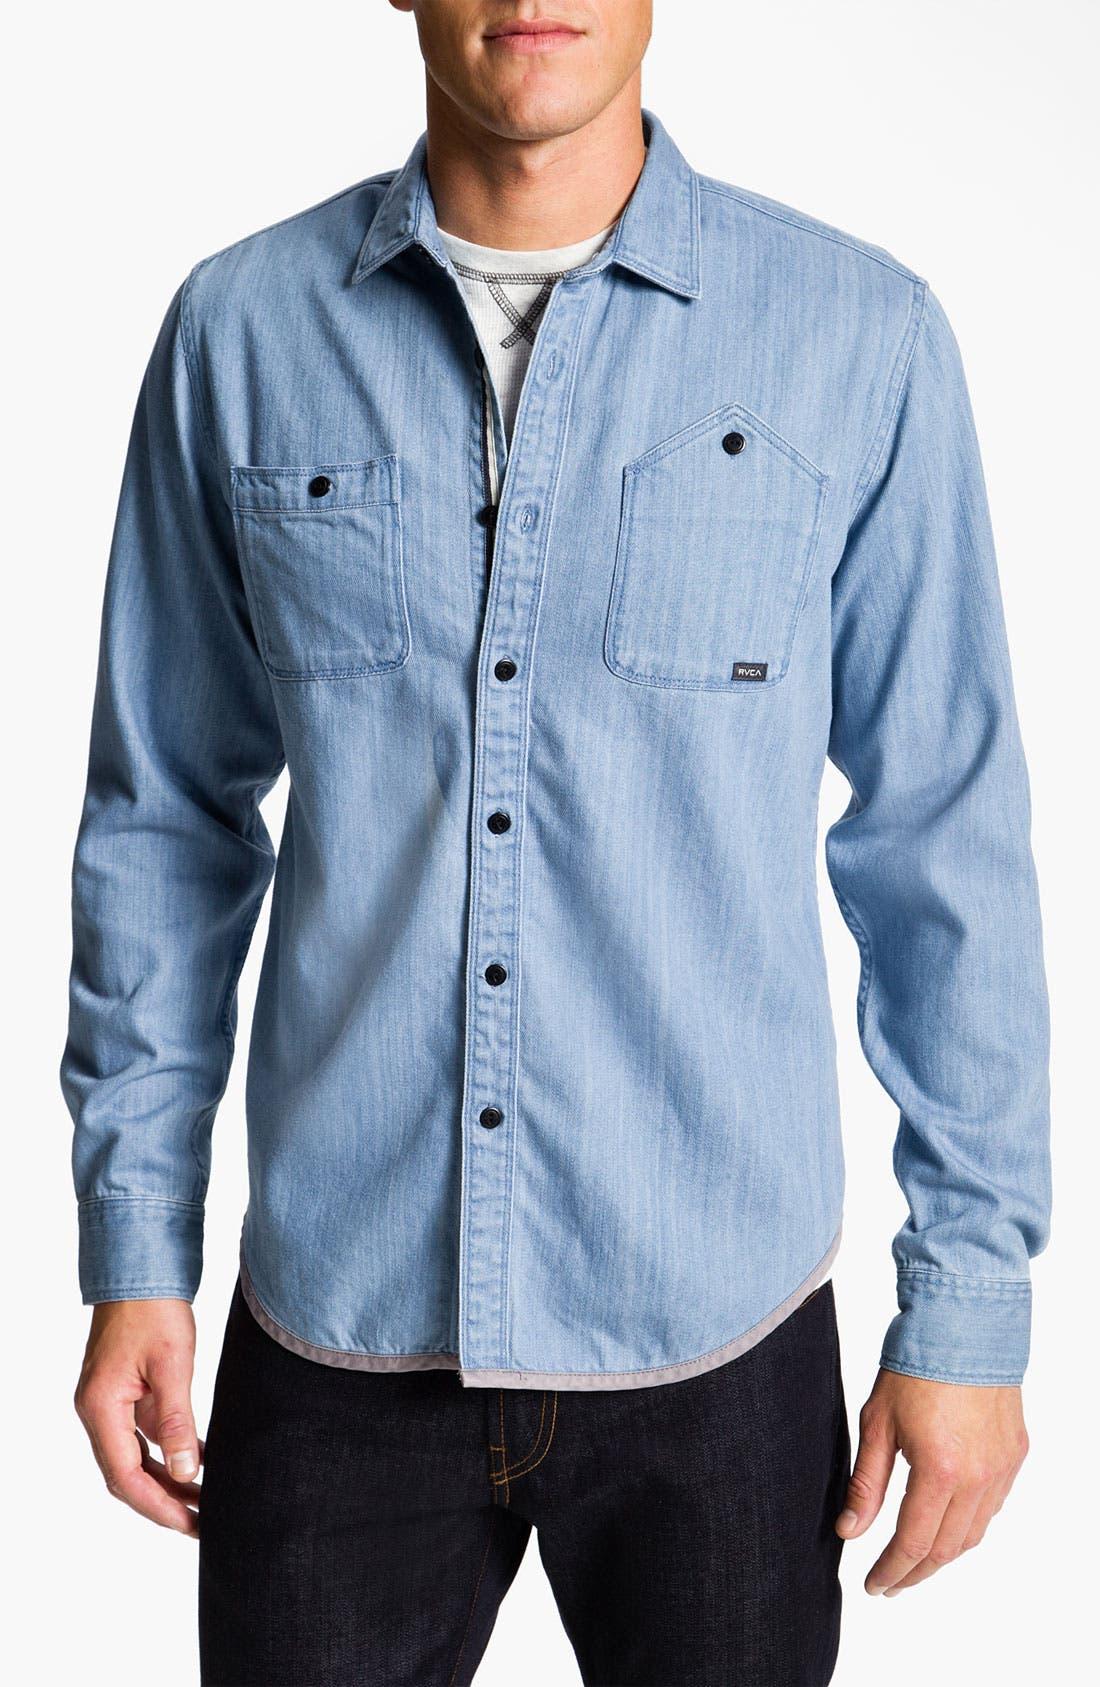 Main Image - RVCA 'Bound' Chambray Woven Shirt